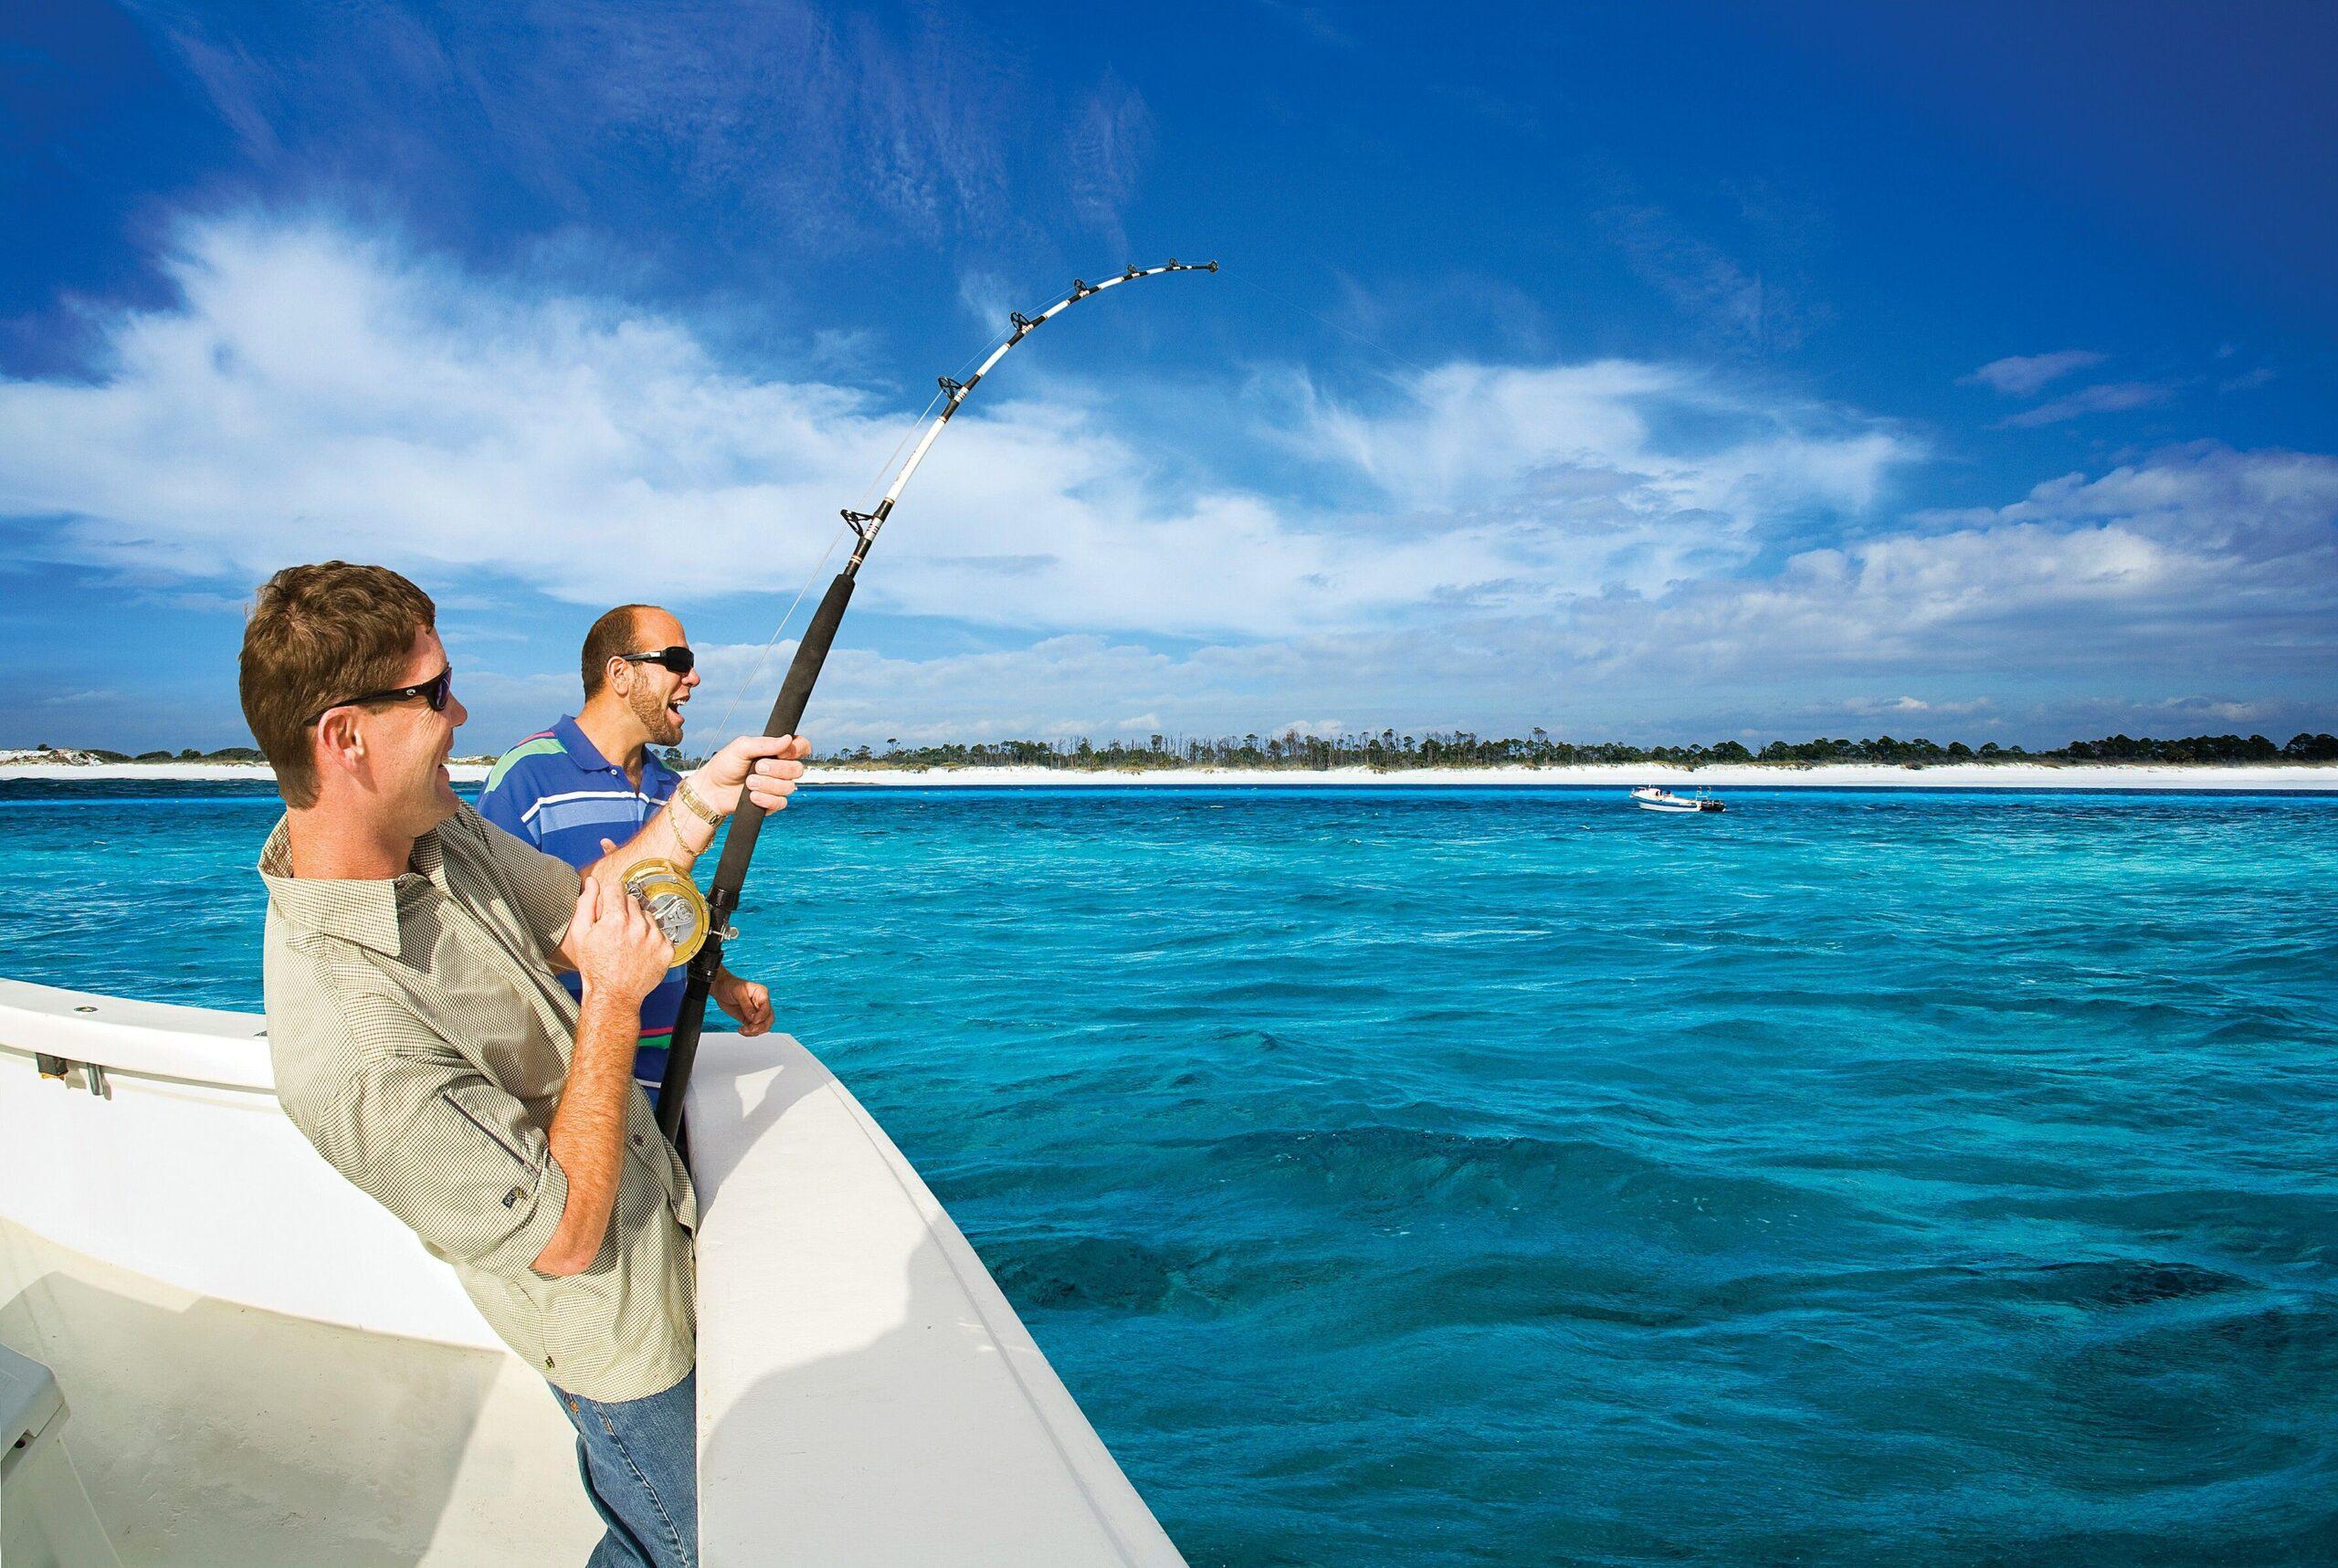 The Inaugural Panama City Beach Fishing Rodeo Kicks Off This Weekend